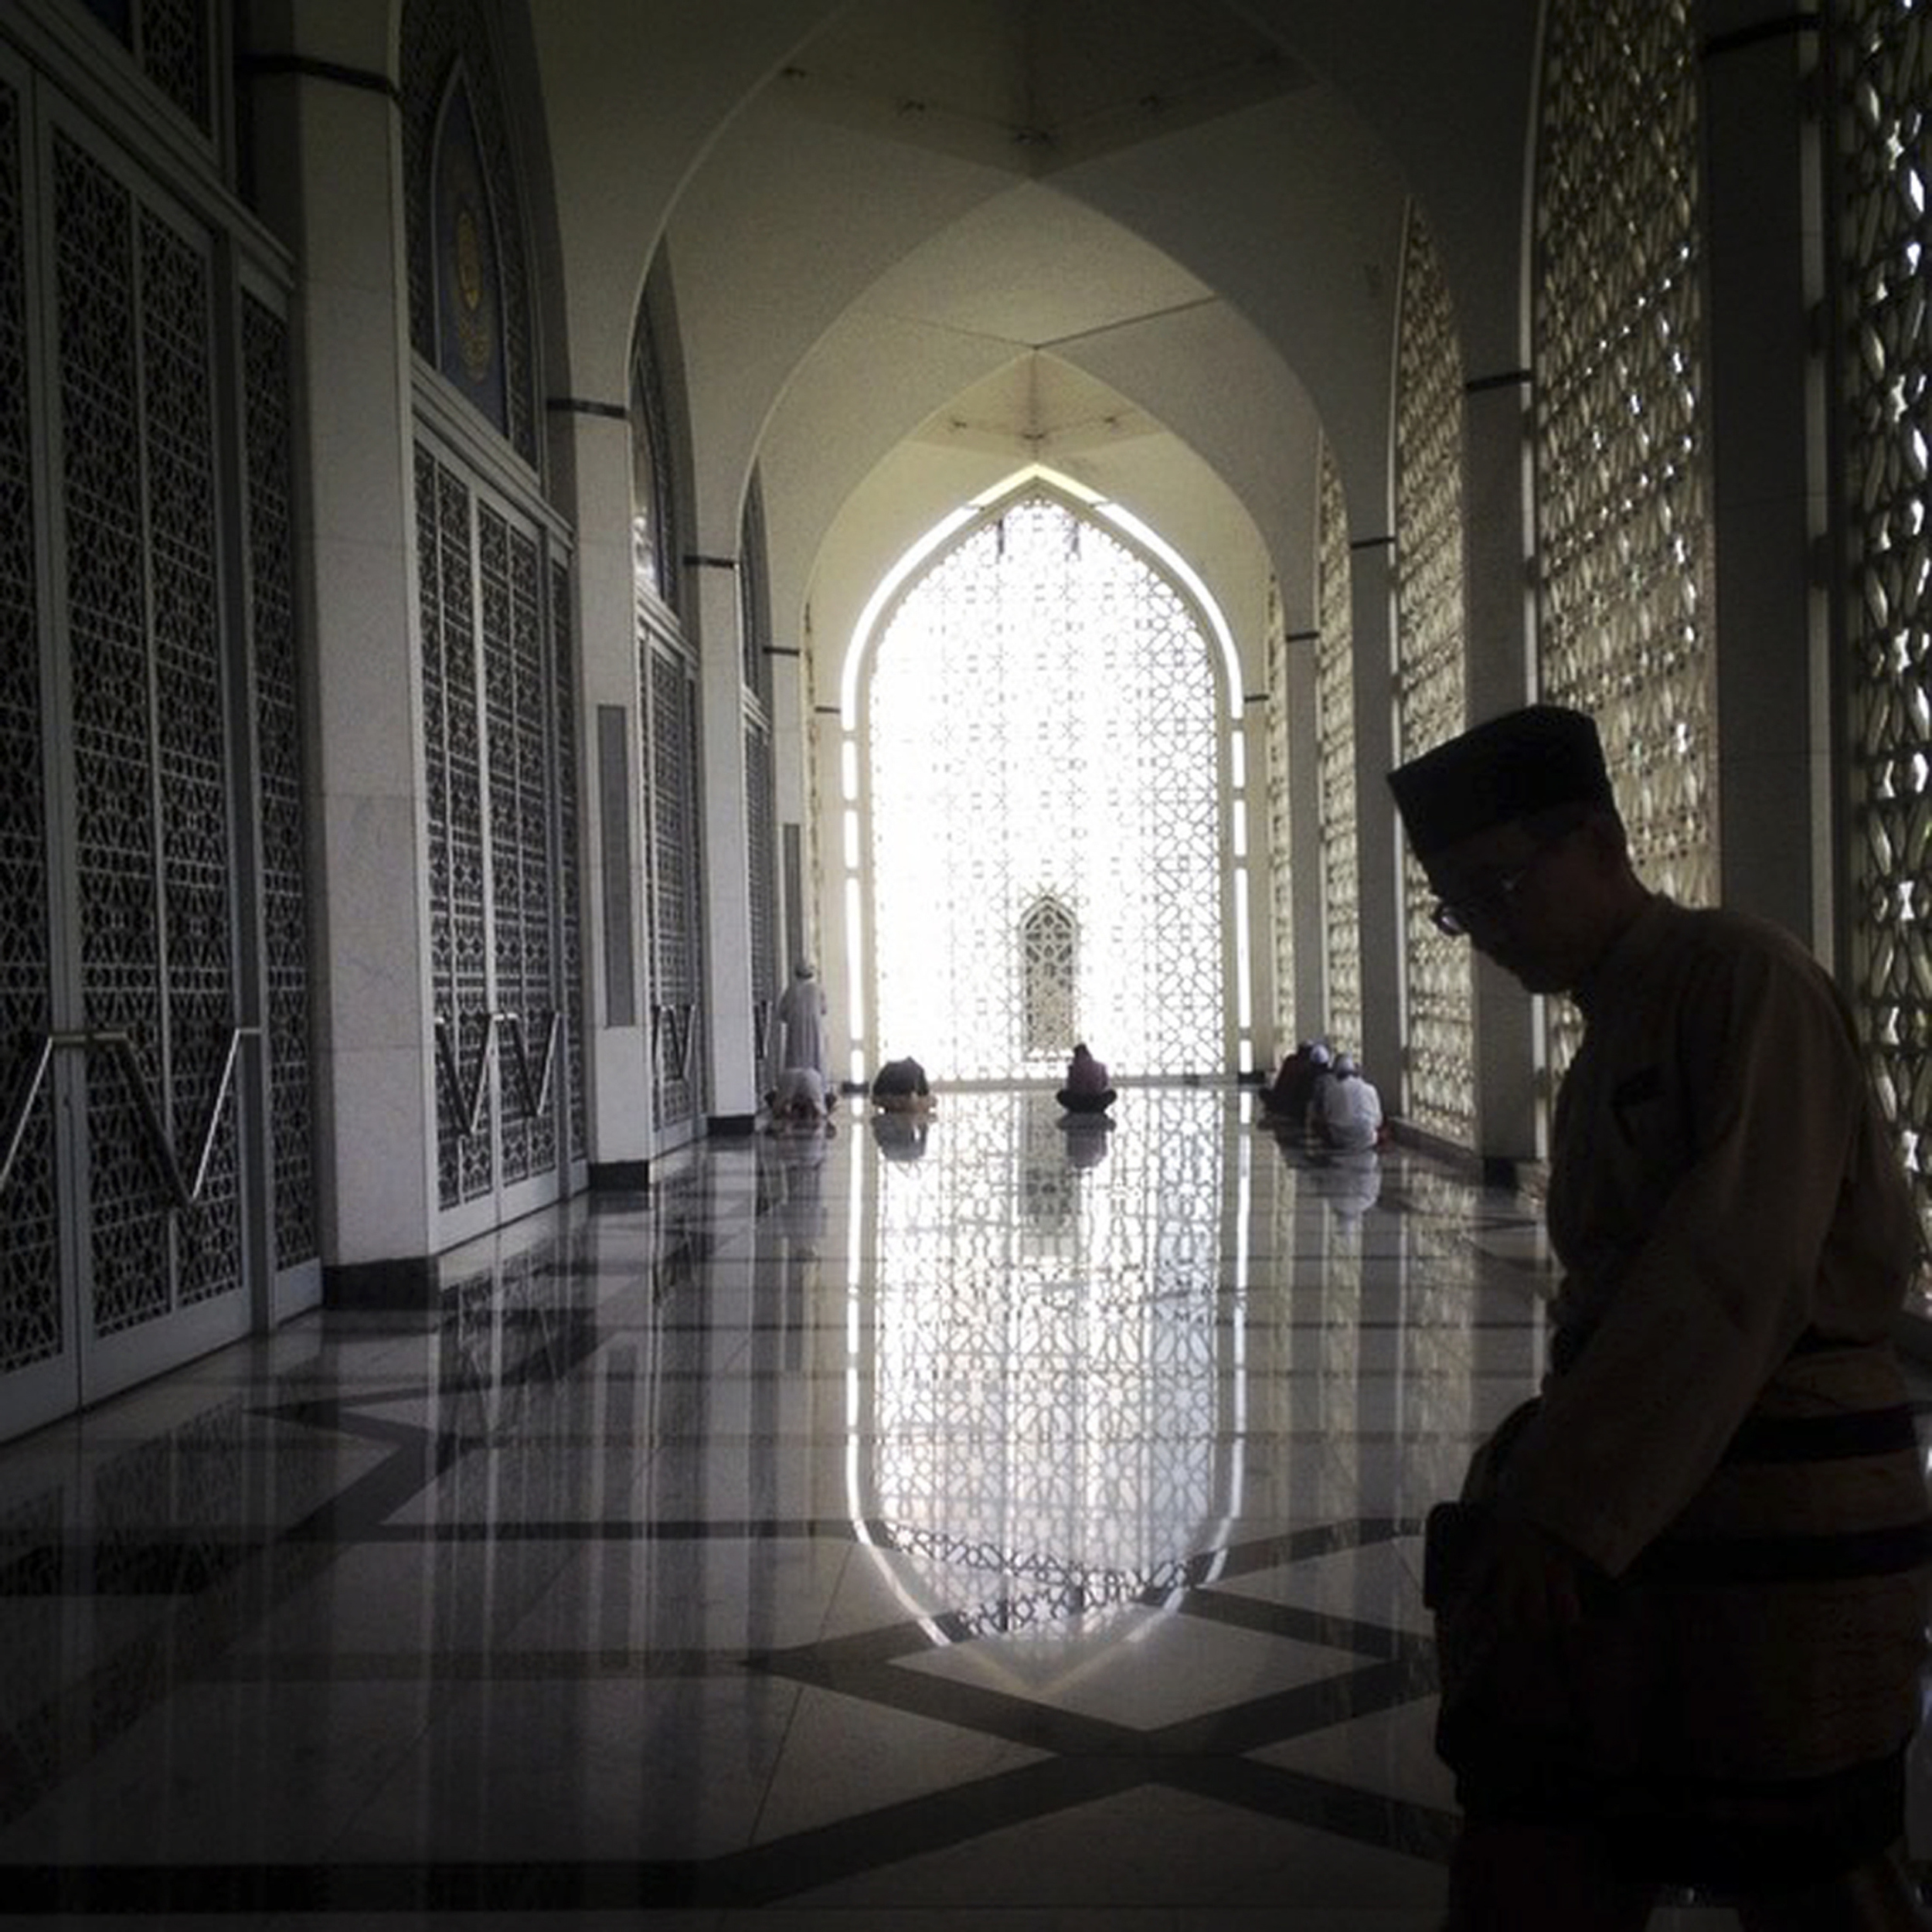 Malaysian Muslims during Jum'ah Prayer at Sultan Salahuddin Abdul Aziz Mosque at Shah Alam, outside Kuala Lumpur, Malaysia. Jum'ah is a congregational prayer that Muslims hold every Friday. (Zulfadhli Zaki)